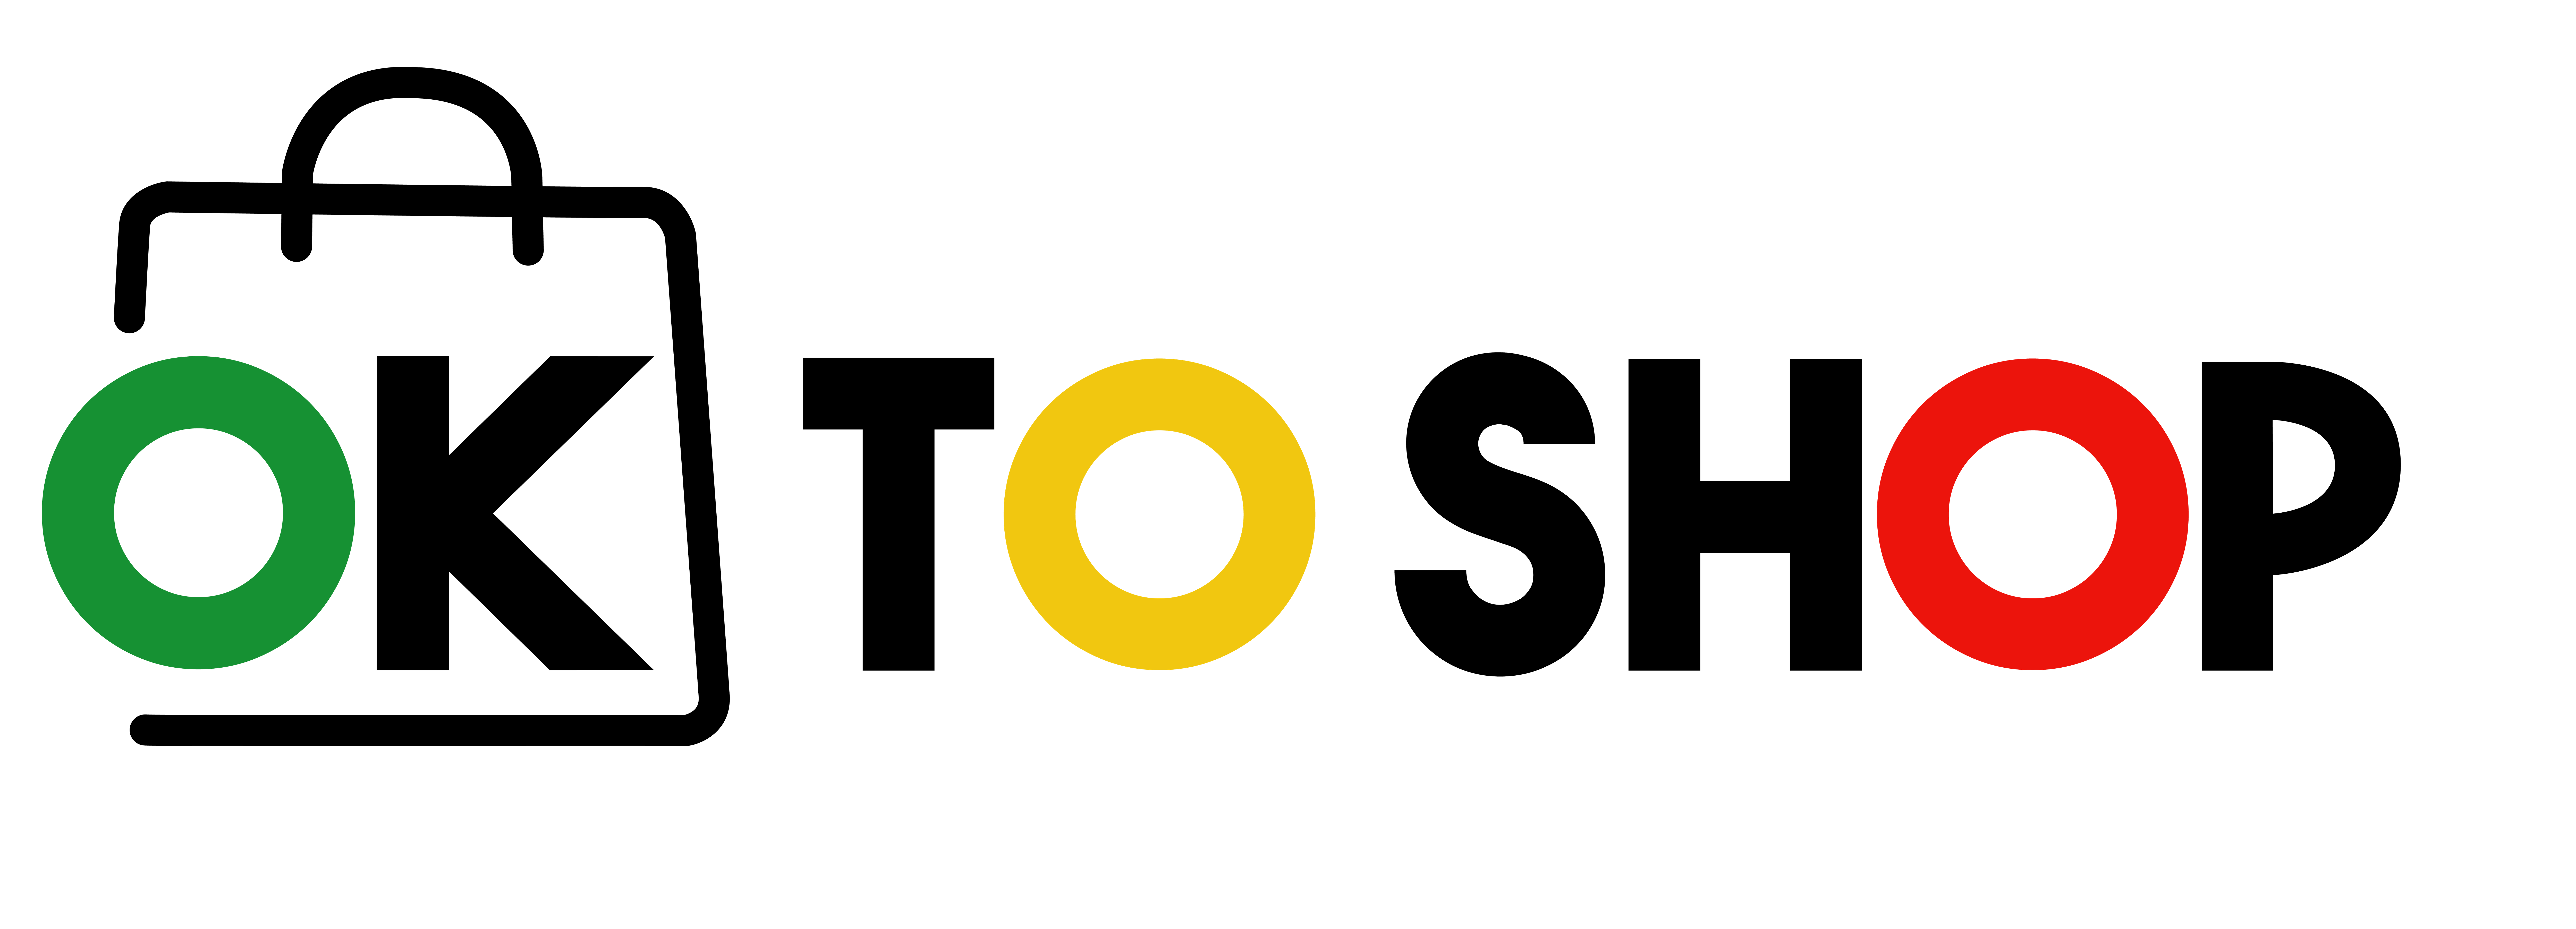 Empresas Desafio10x: OK to Shop